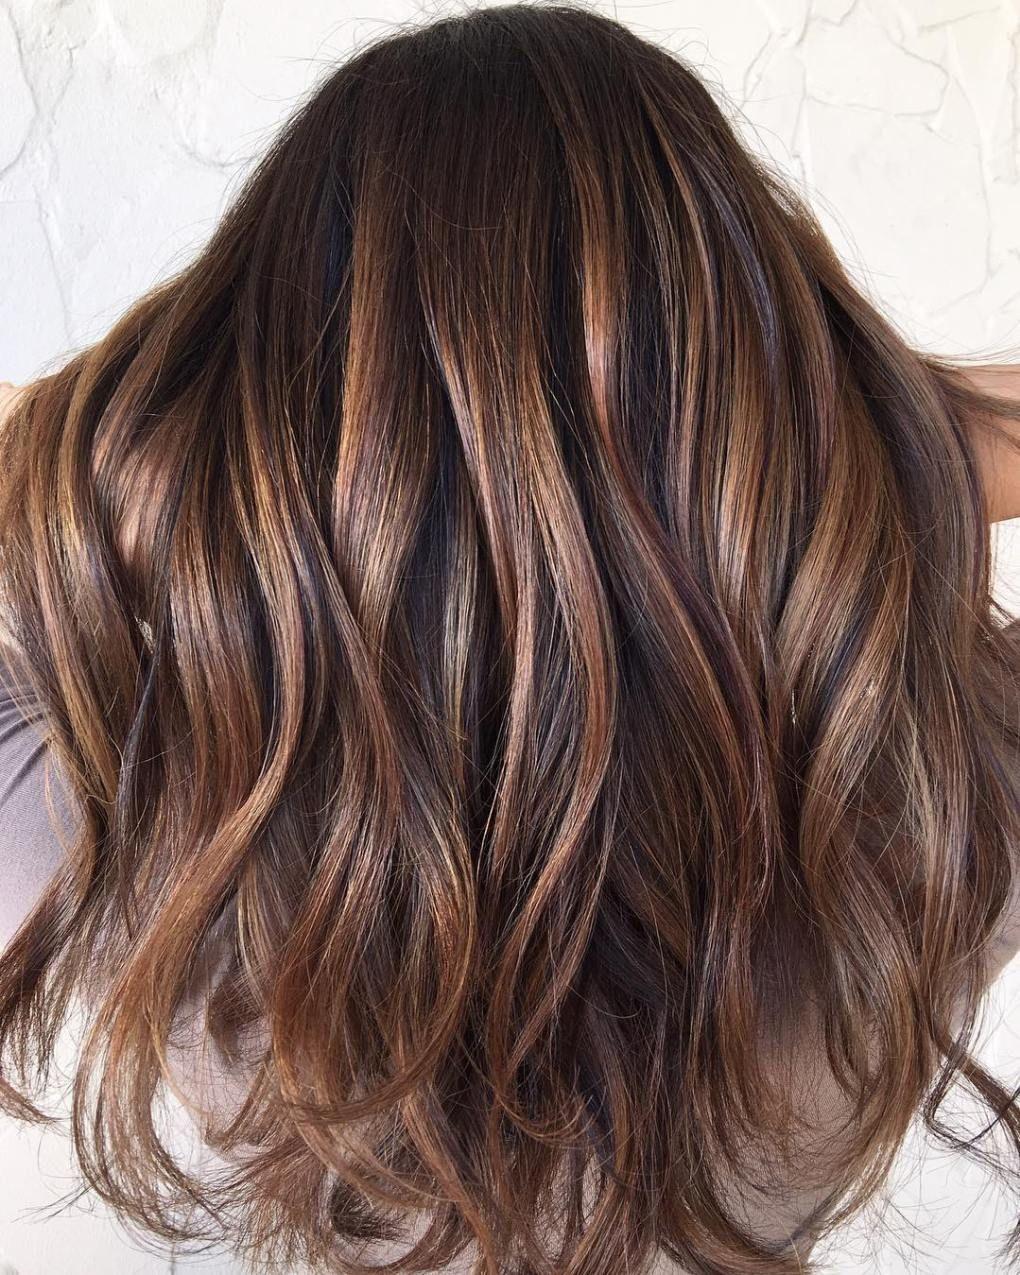 Bronze Caramel hair color